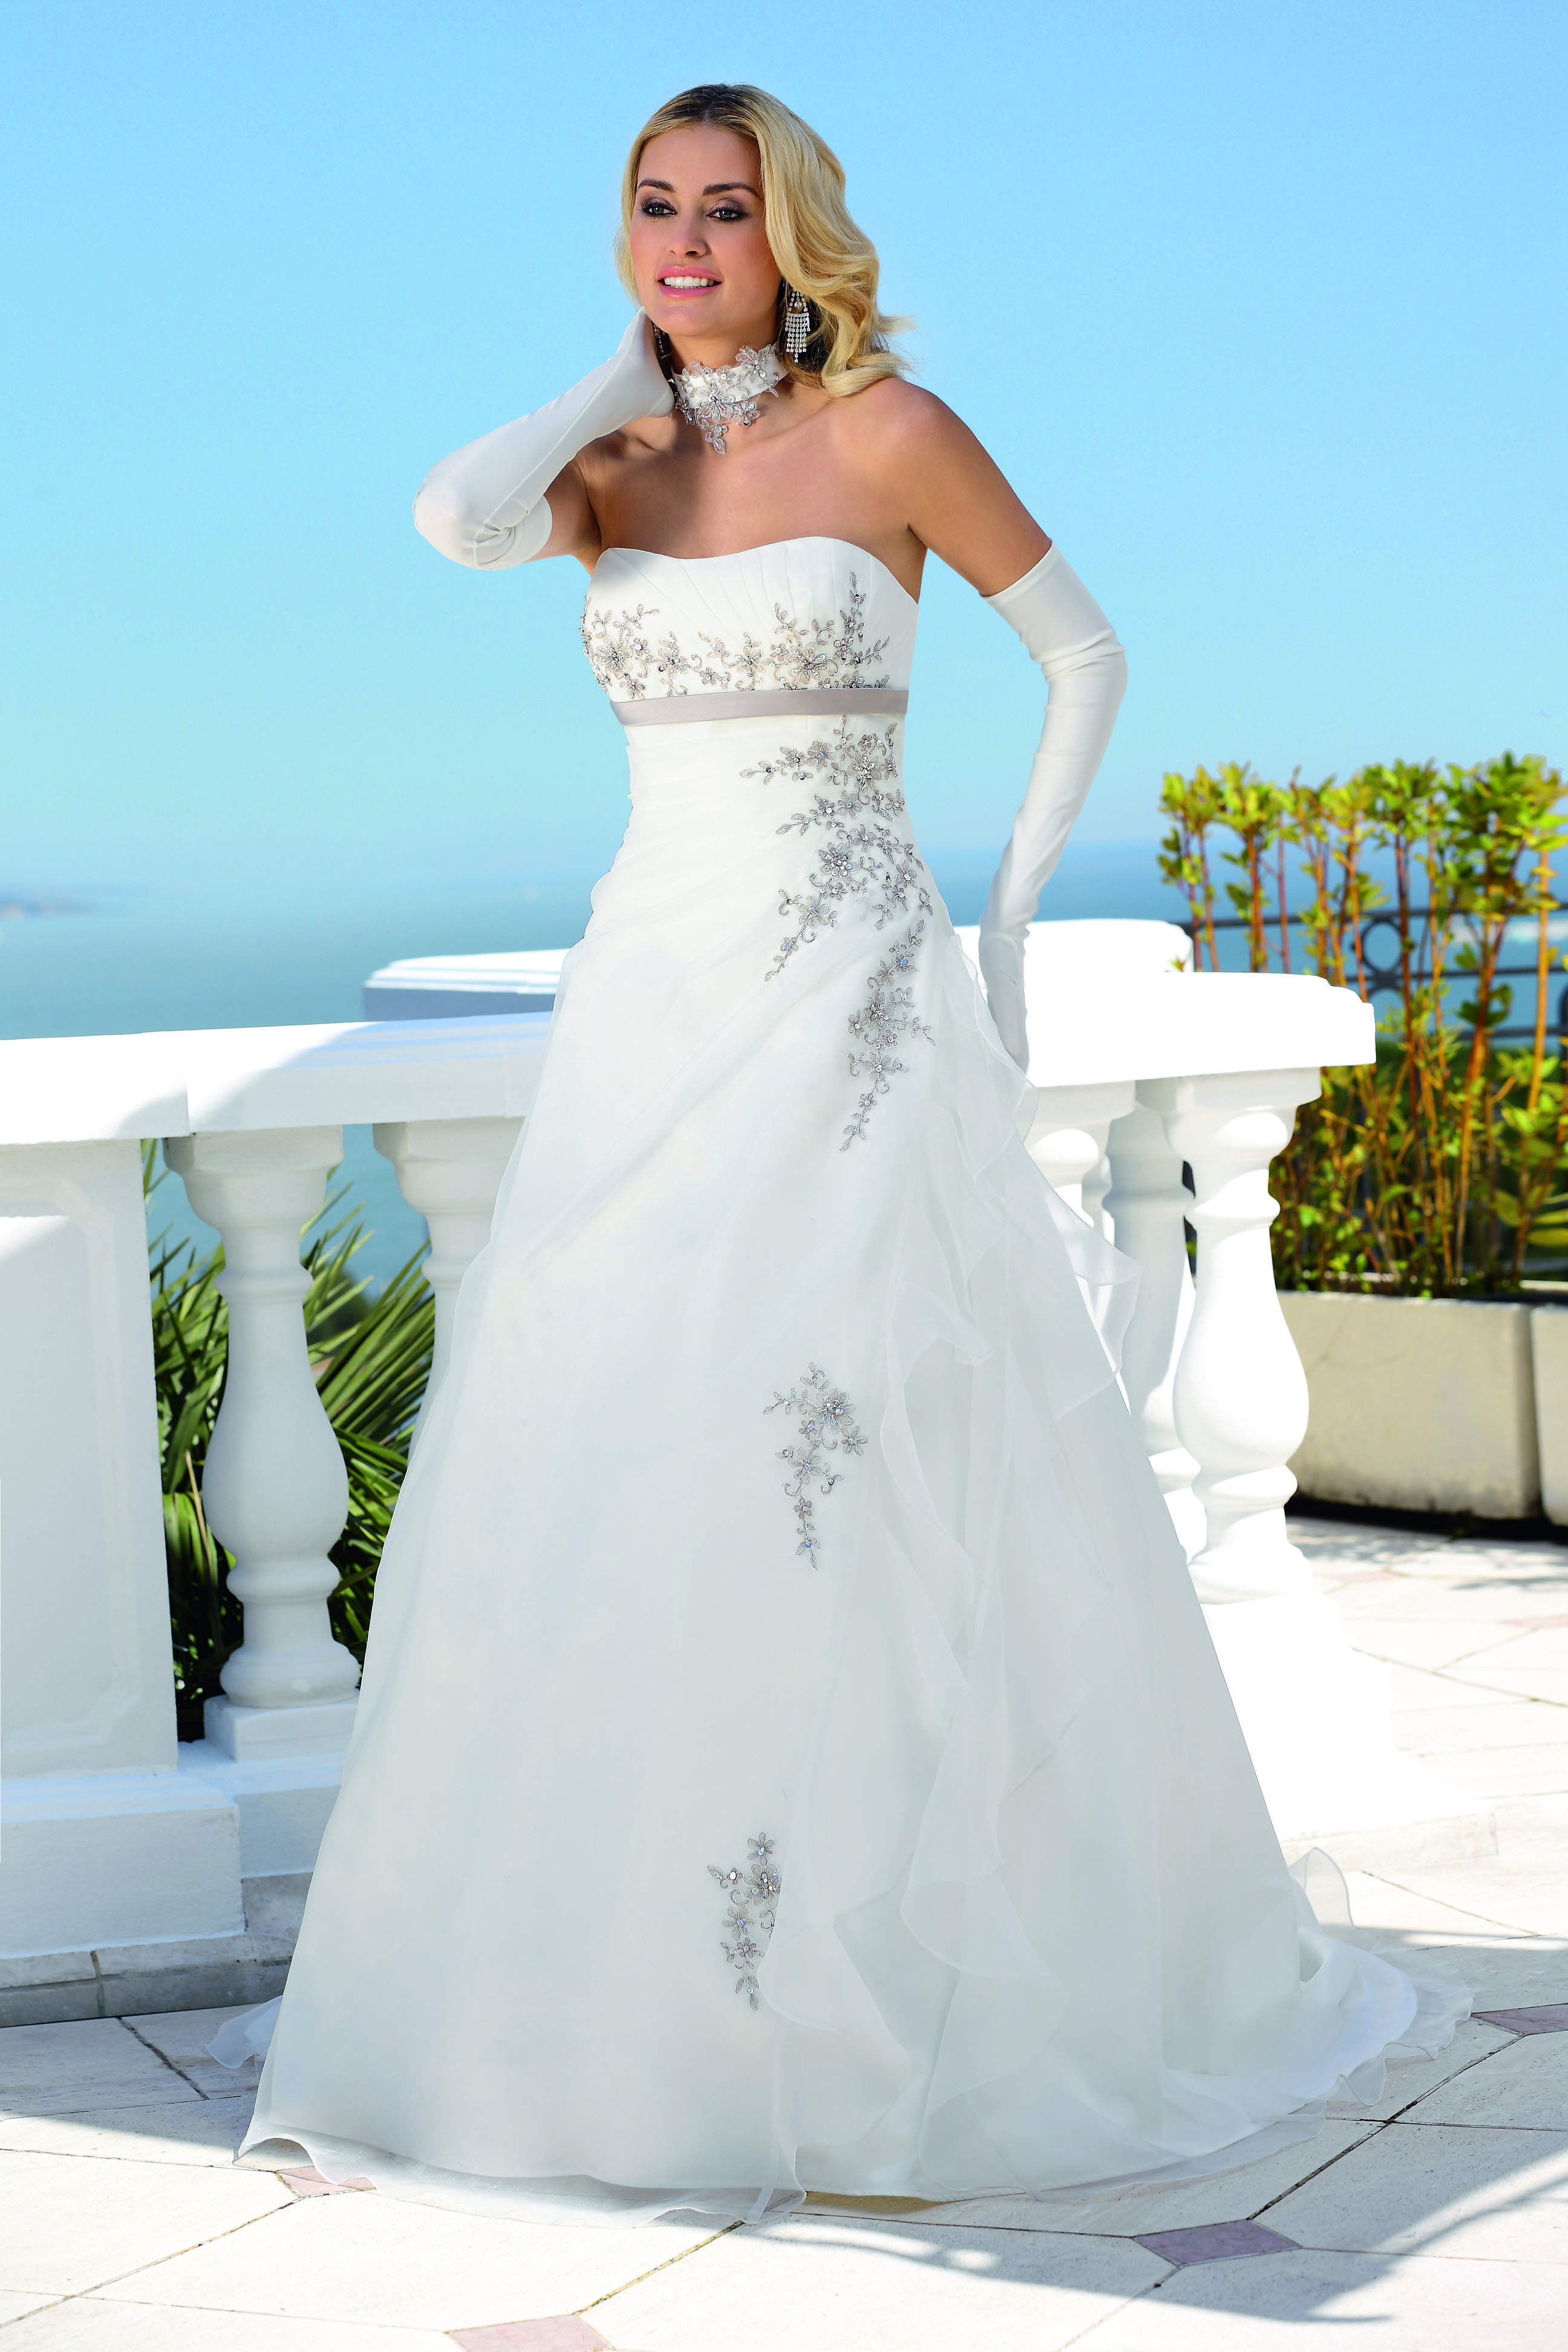 Ladybird 2014 Modell: 34089 | Brautkleider | Pinterest | Modell ...